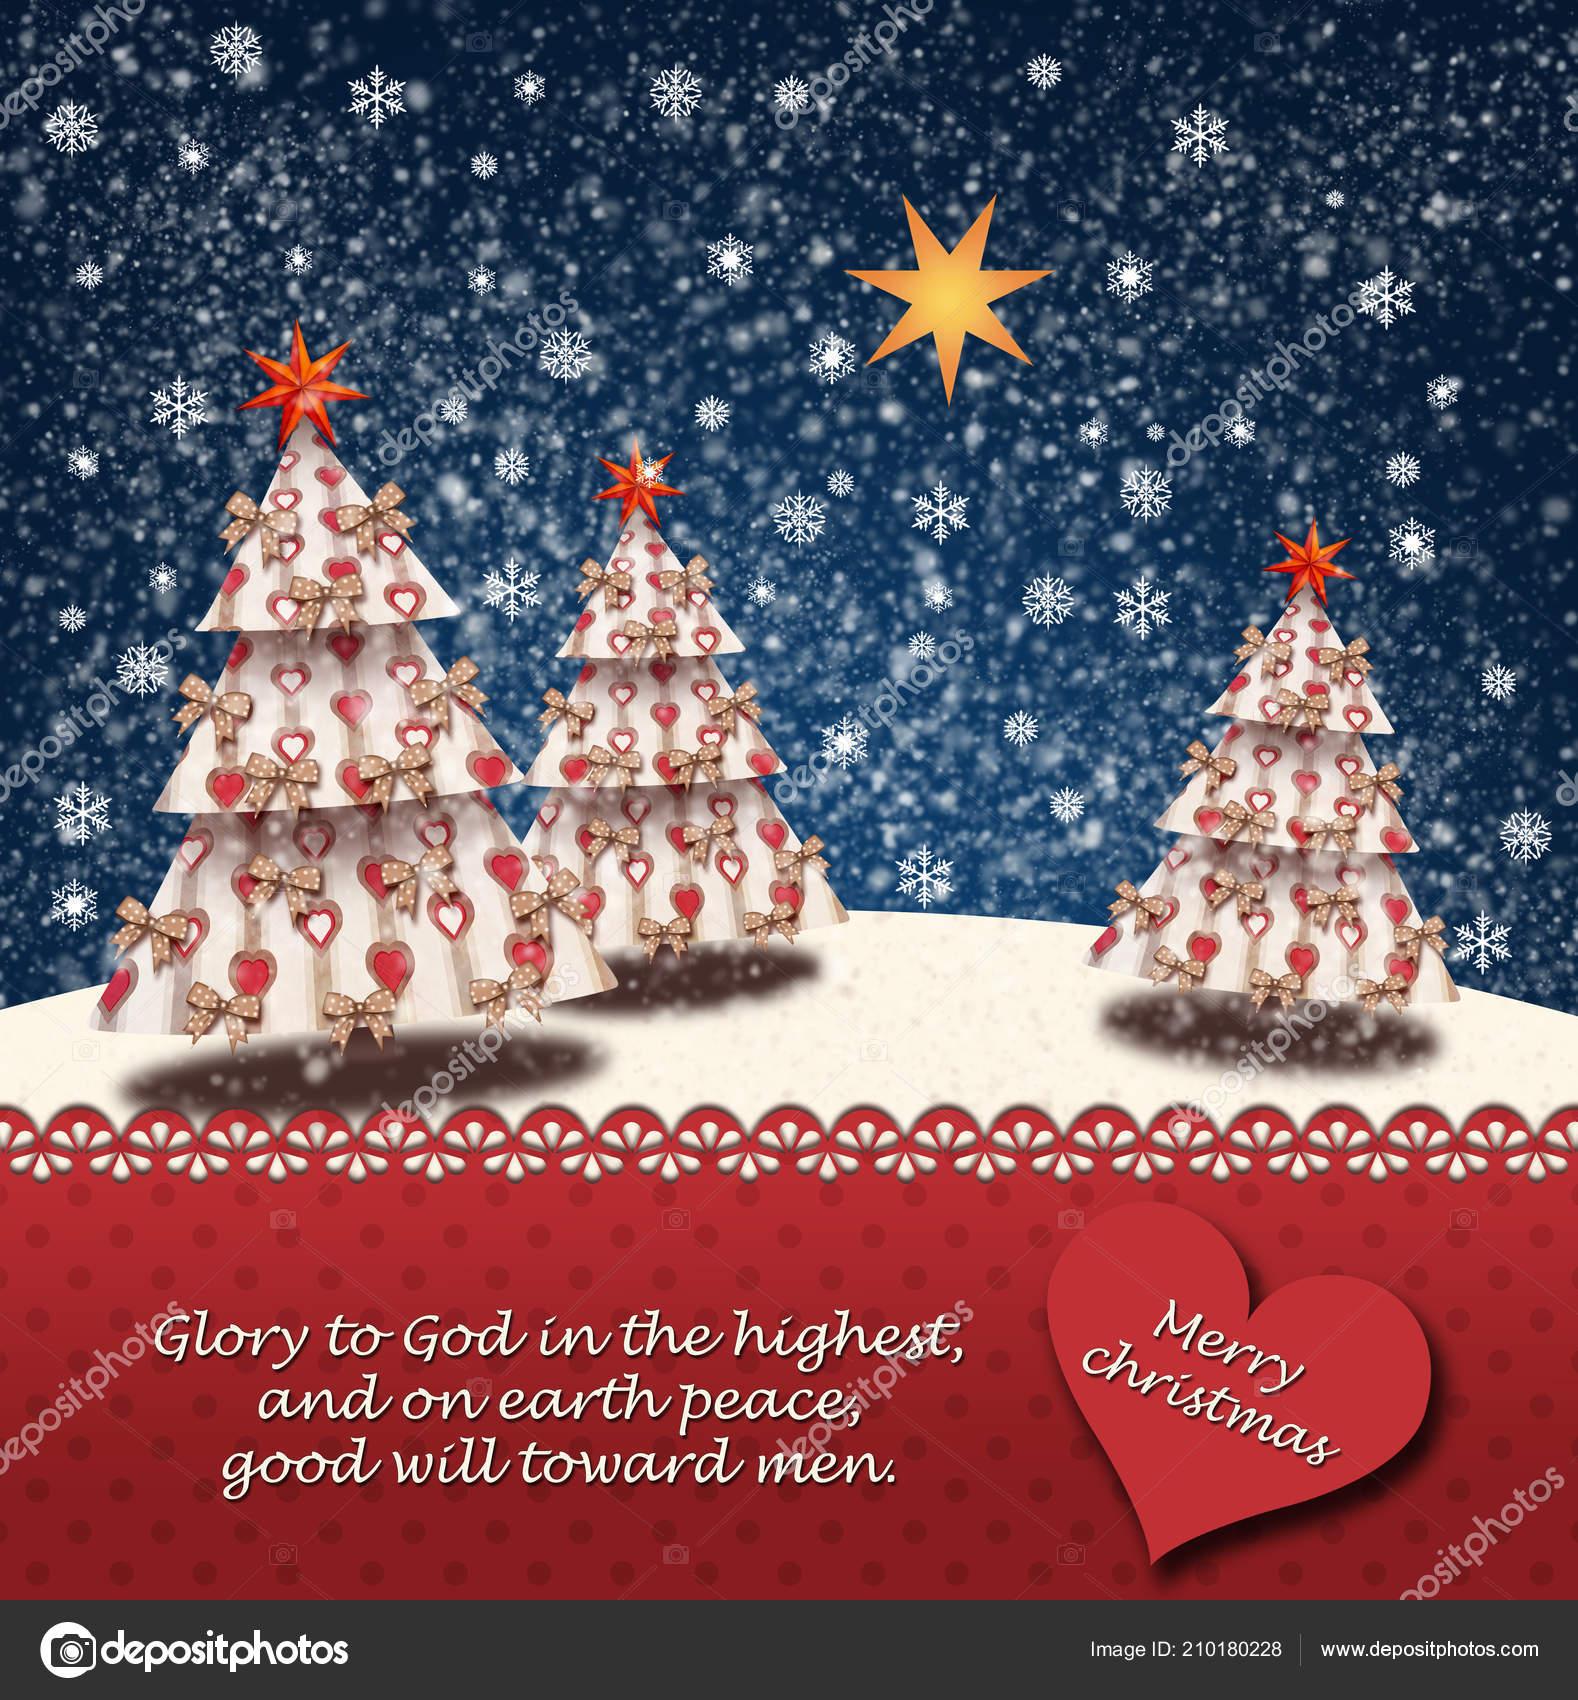 Christmas Quotes Bible.Snowy Landscape Christmas Trees Star Betlehem Bible Quotes